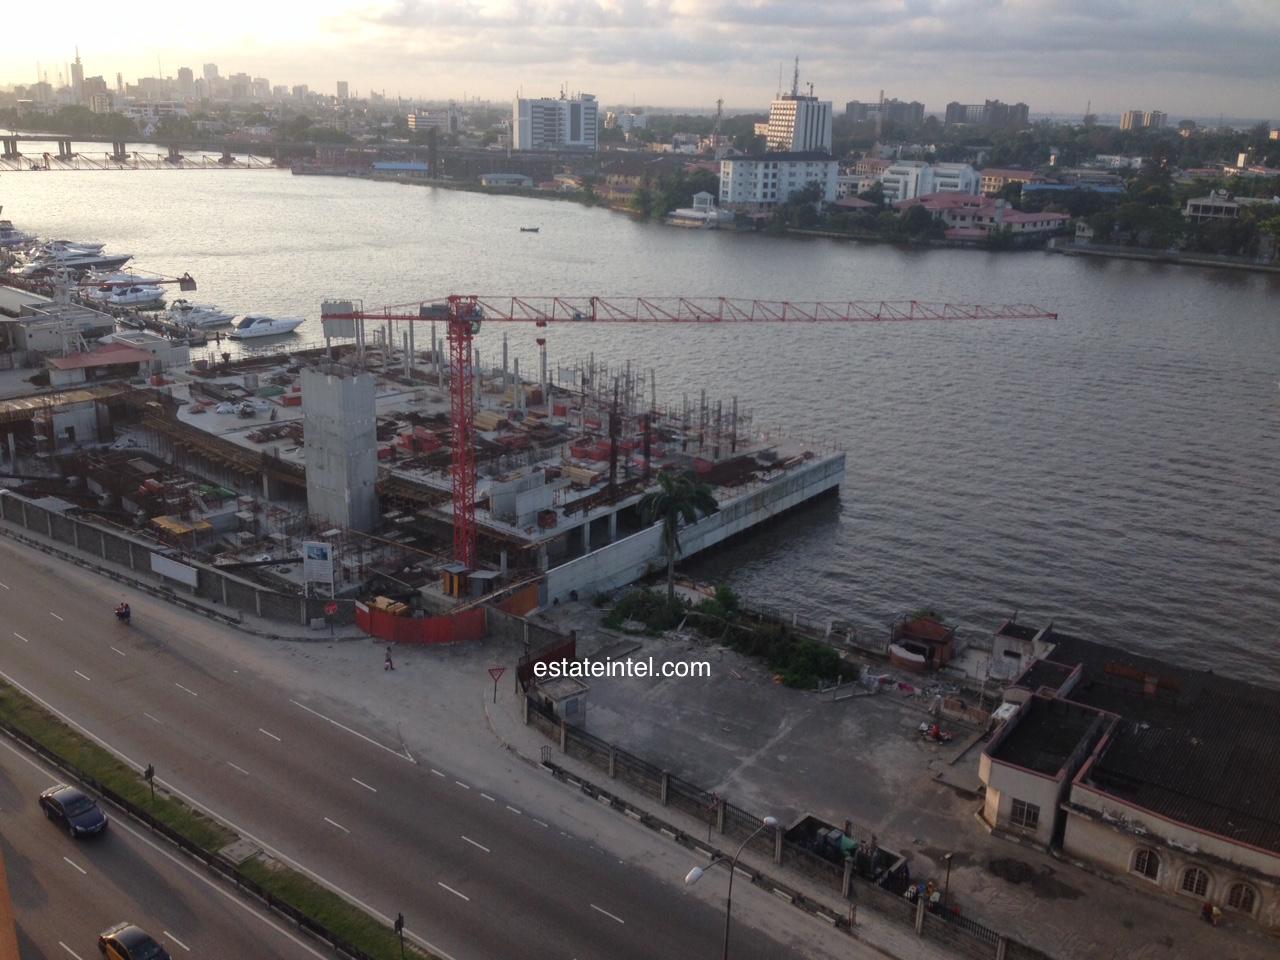 Marriott Lagos Waterfront Hotel (Marriott Lagos, Victoria Island) - Ozumba Mbadiwe Avenue